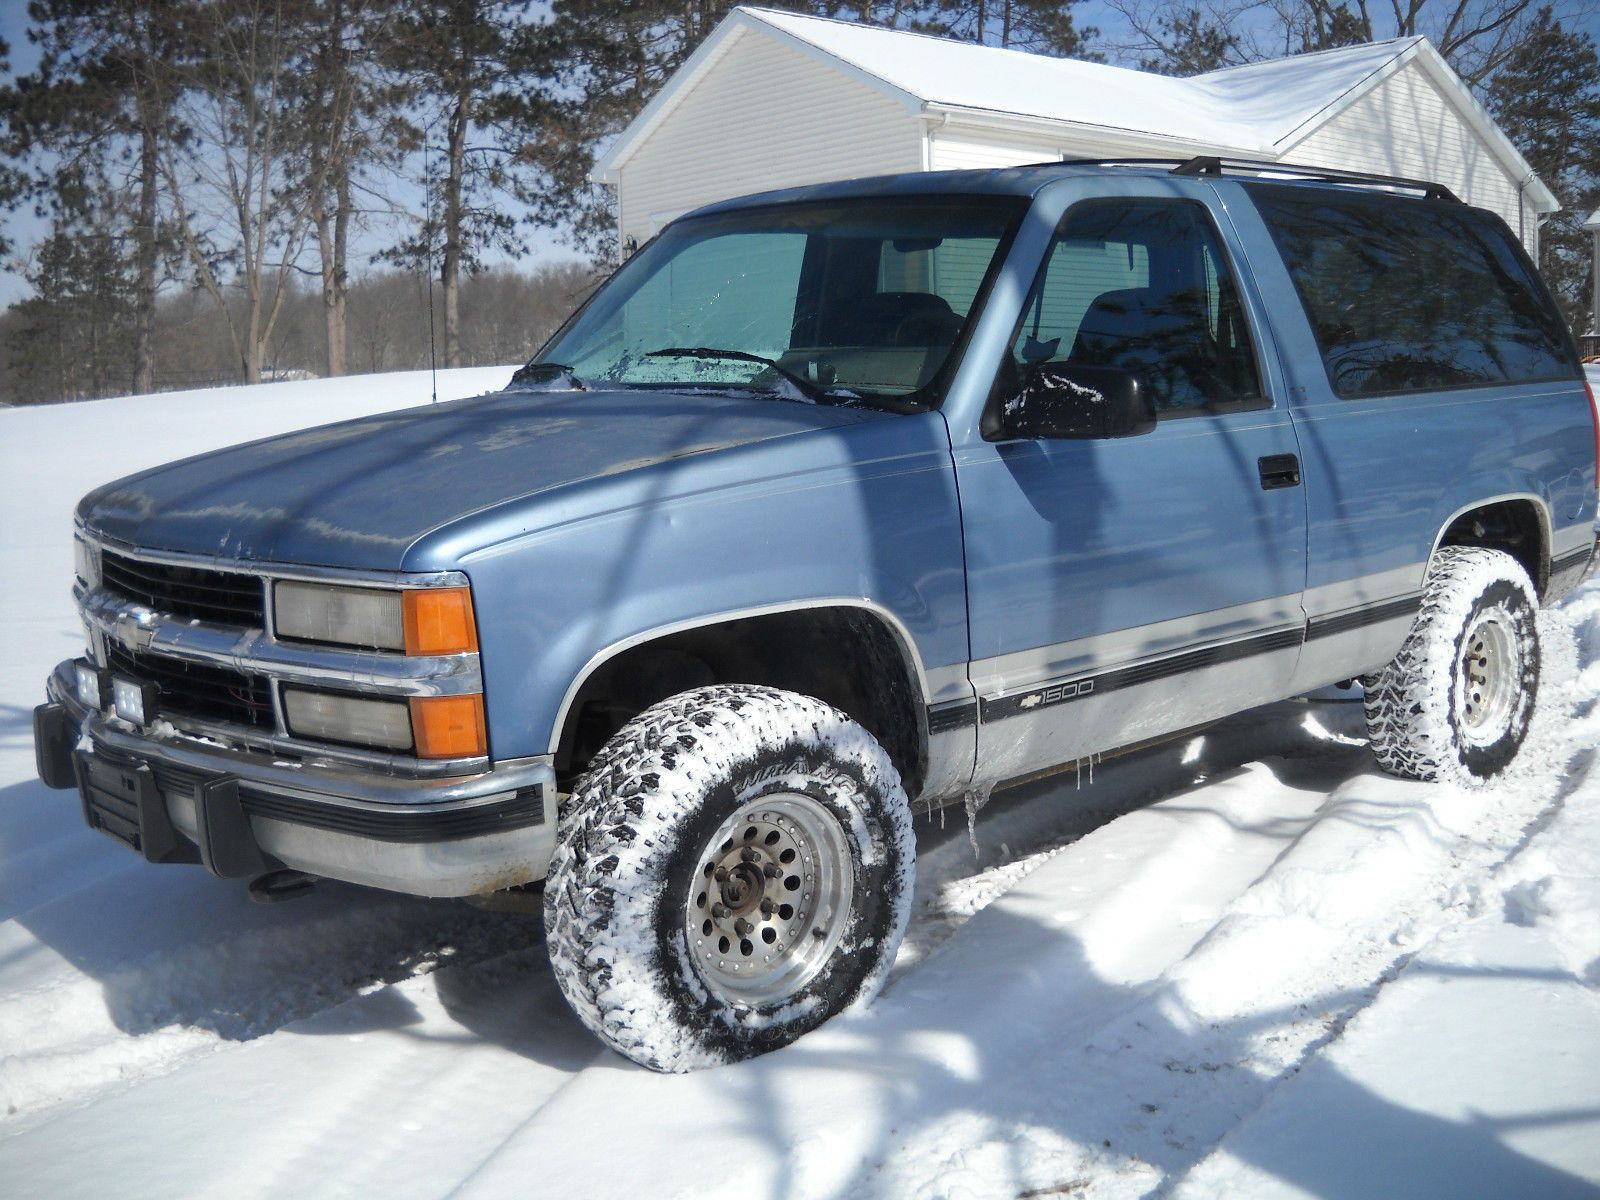 1994 chevy blazer k5 full size 1500 5 speed manual